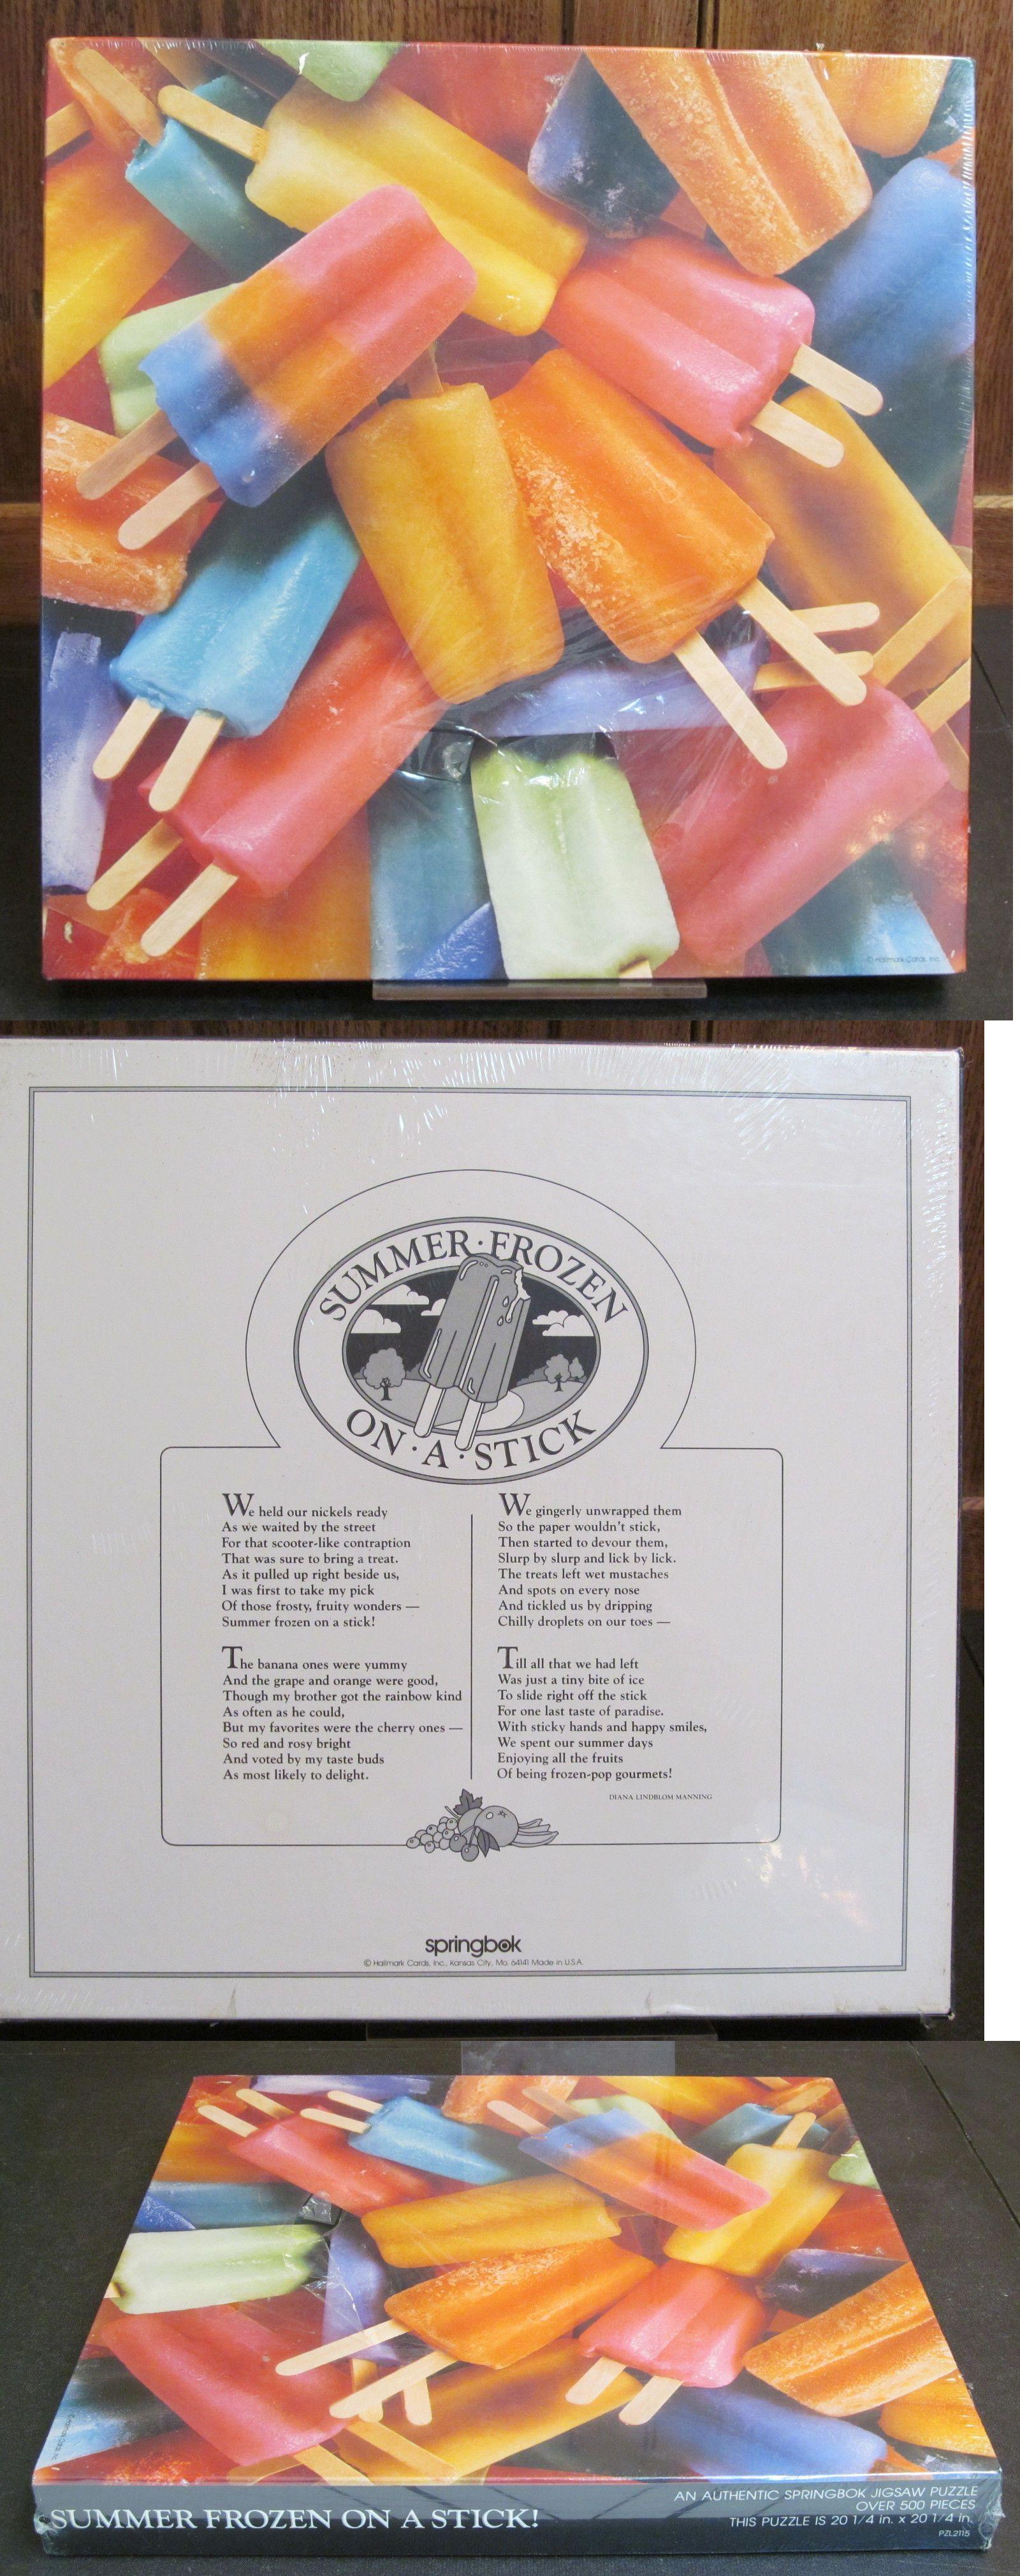 Jigsaw 19189: Springbok Puzzle 500 Pieces Summer Frozen On A